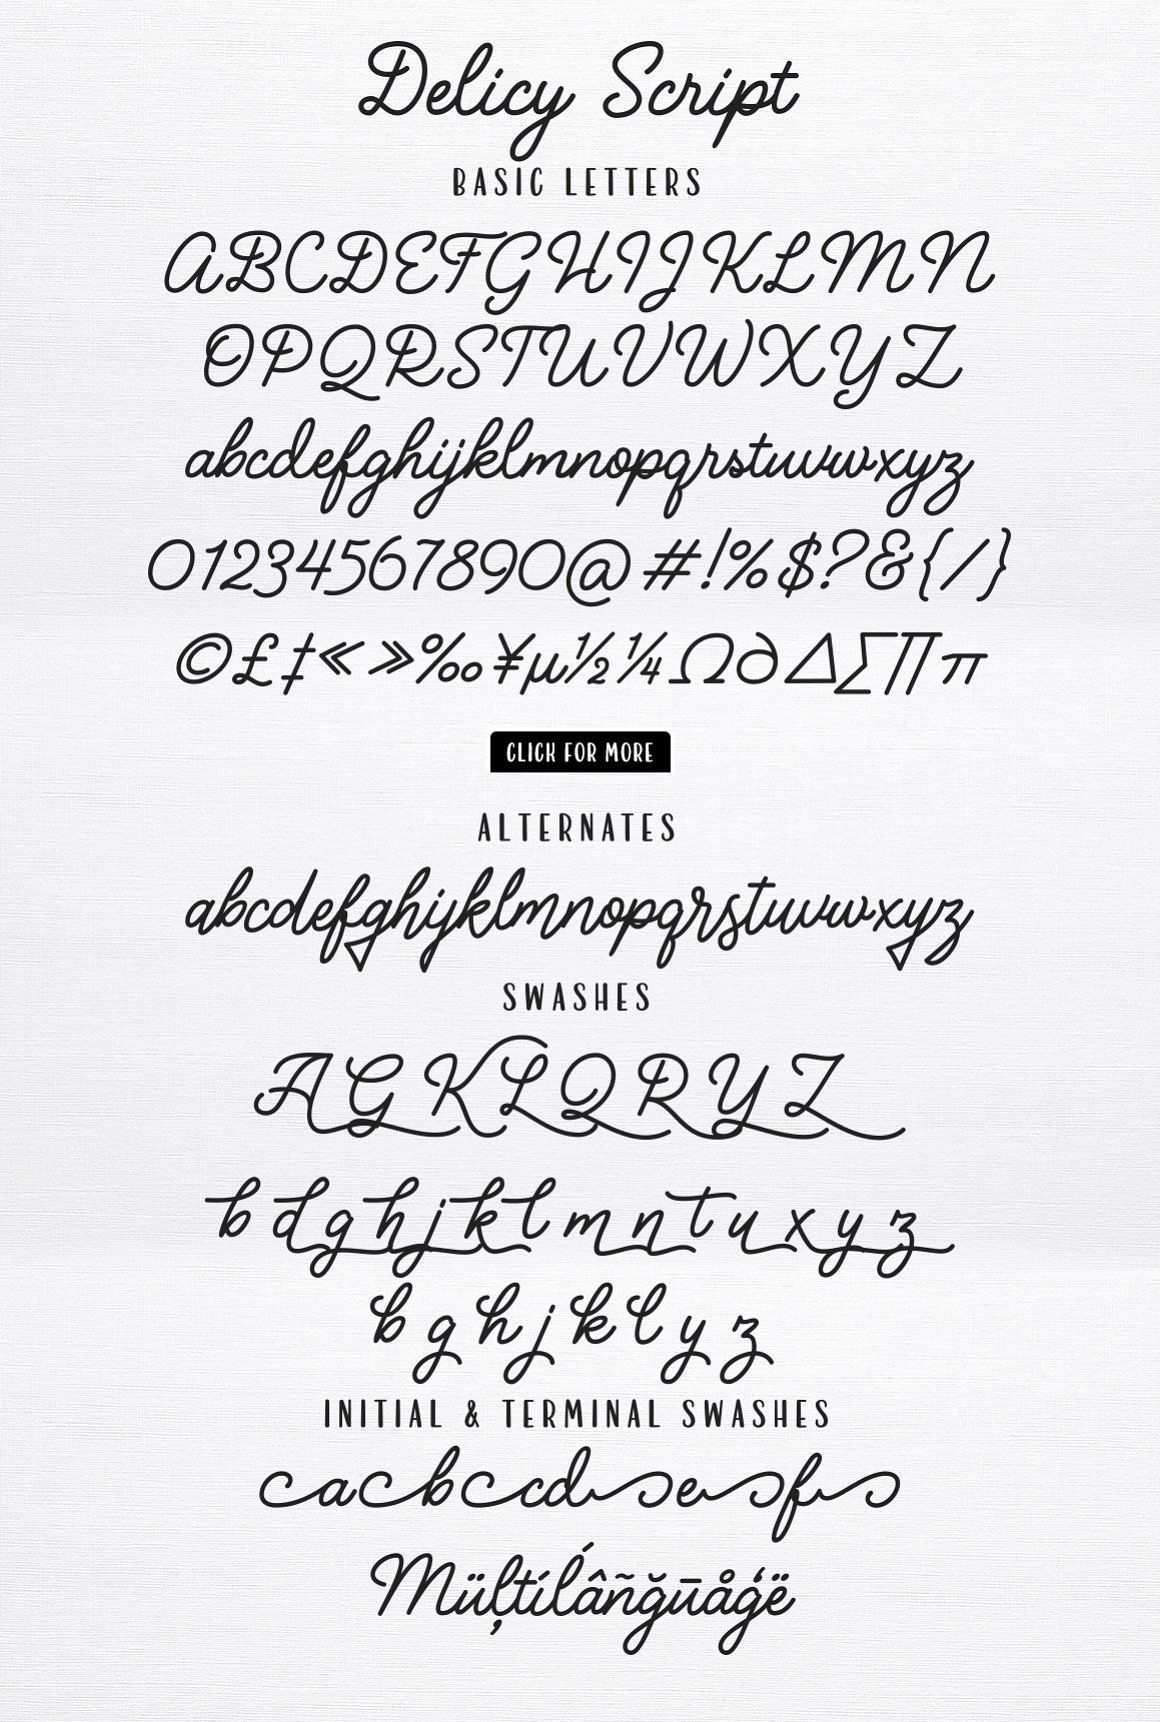 Delicy Lettering Alphabet Lettering Abc Alphabet